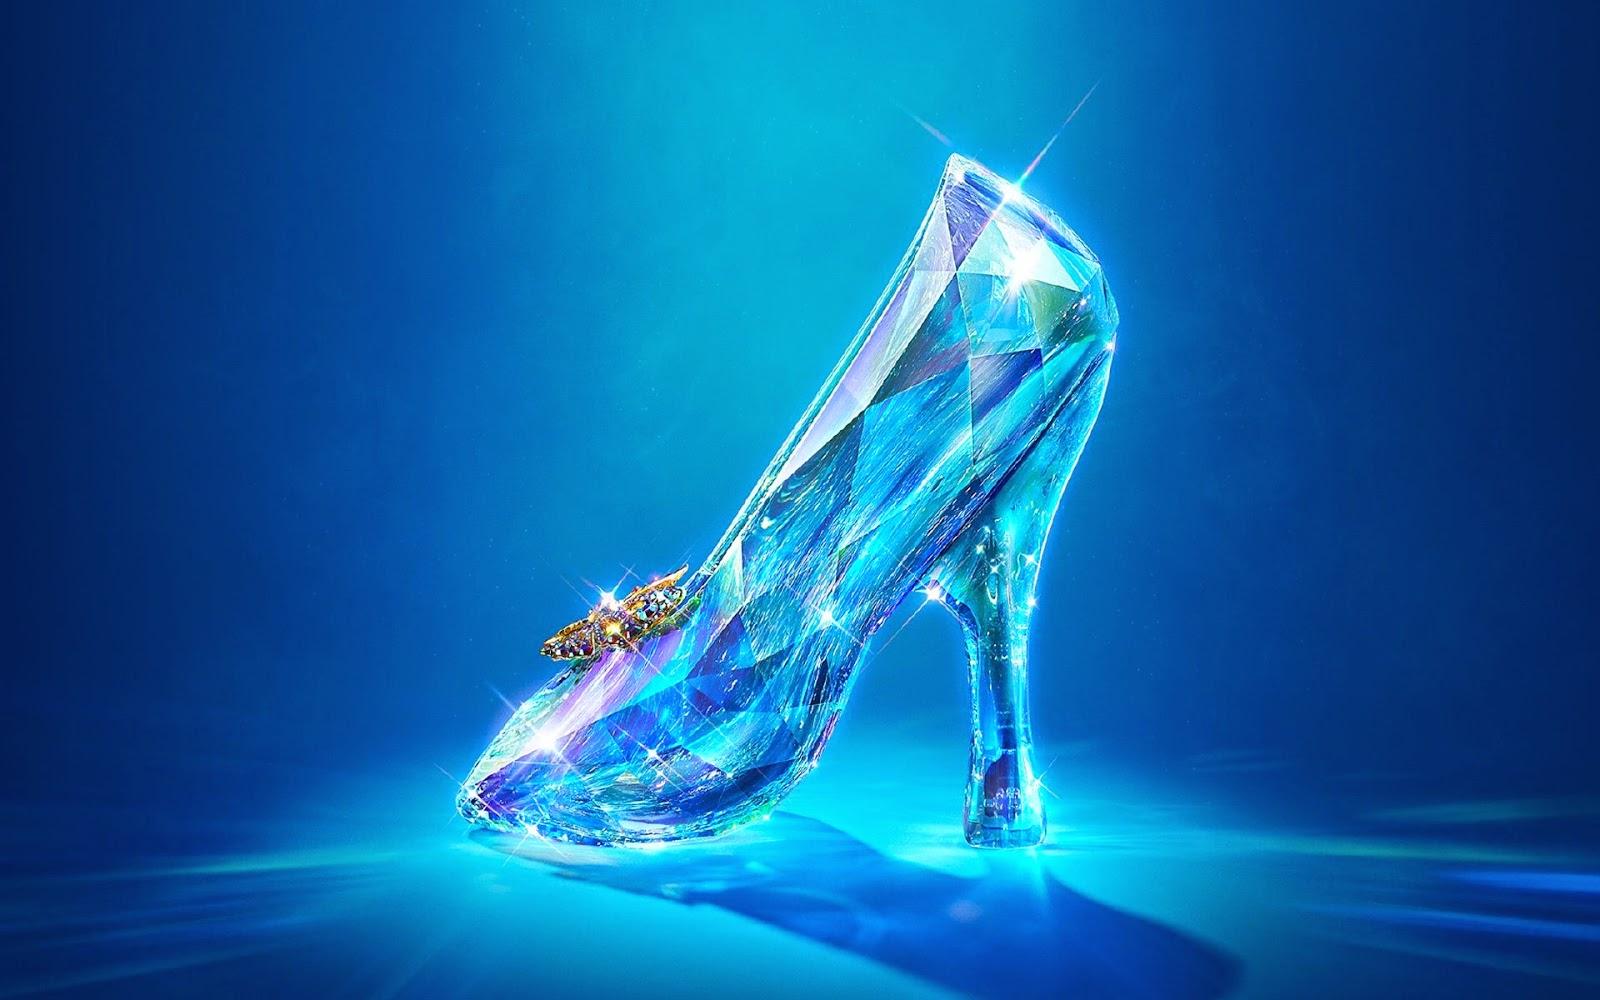 Sinopsis FIlm Cinderella 2015 | SINOPSIS DAN REVIEW FILM